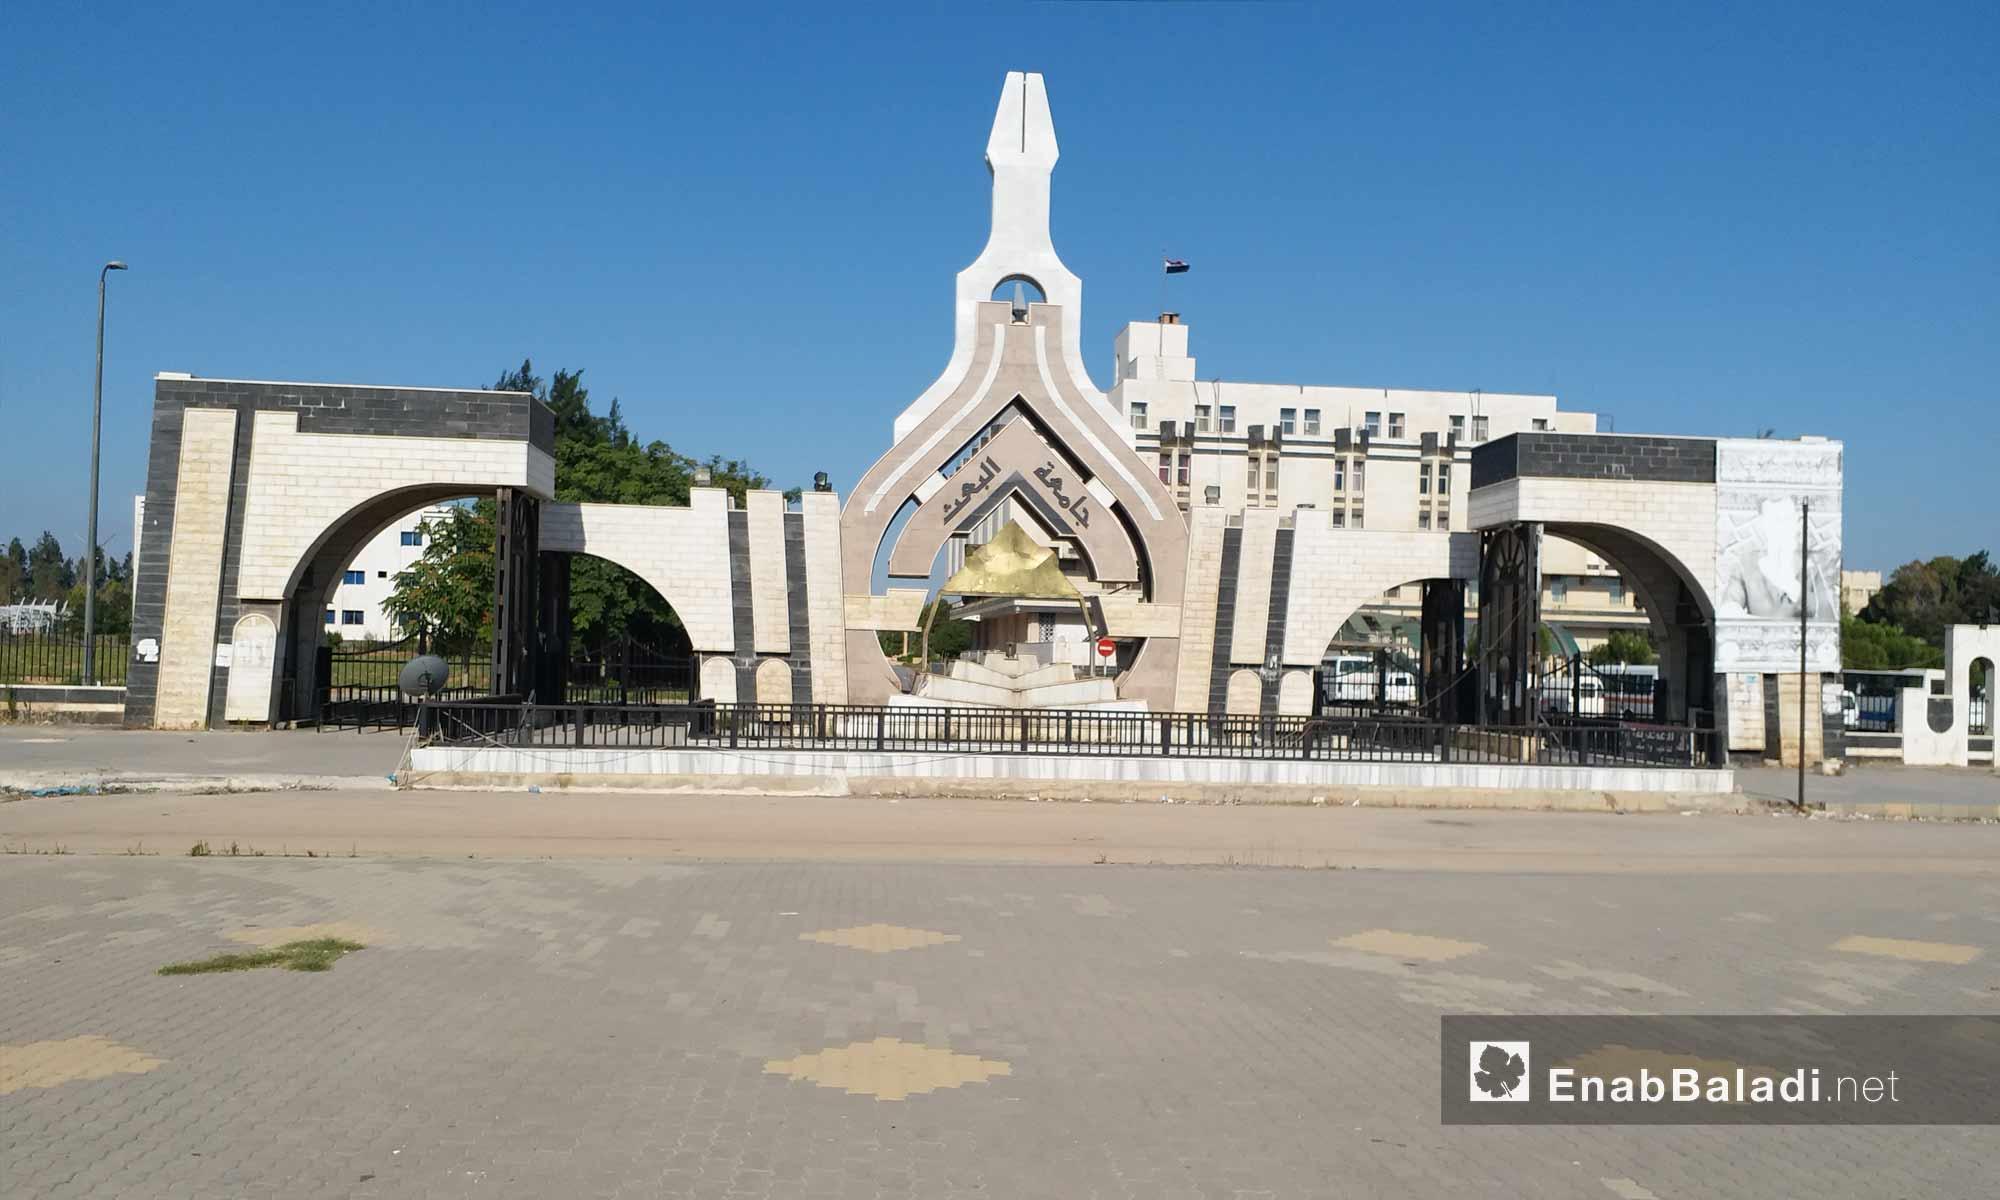 The entrance to Ba'ath University, Homs city - August 19, 2018 (Enab Baladi)